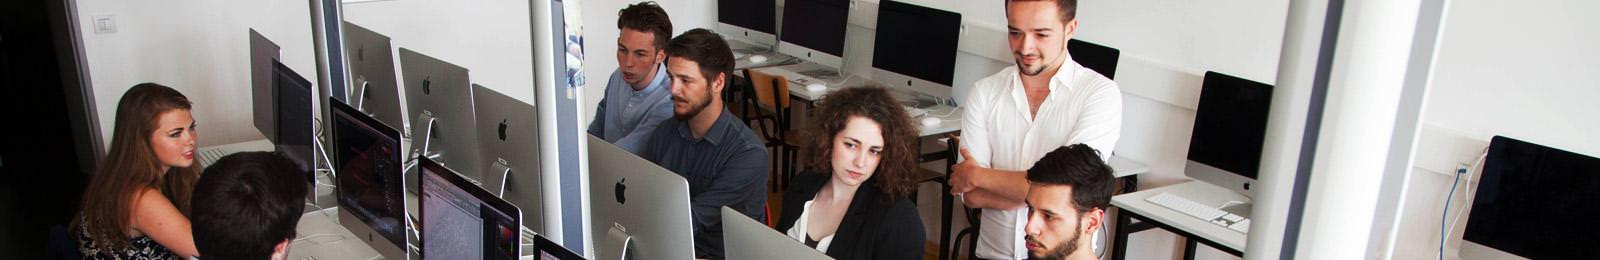 visuel métiers web digital campus